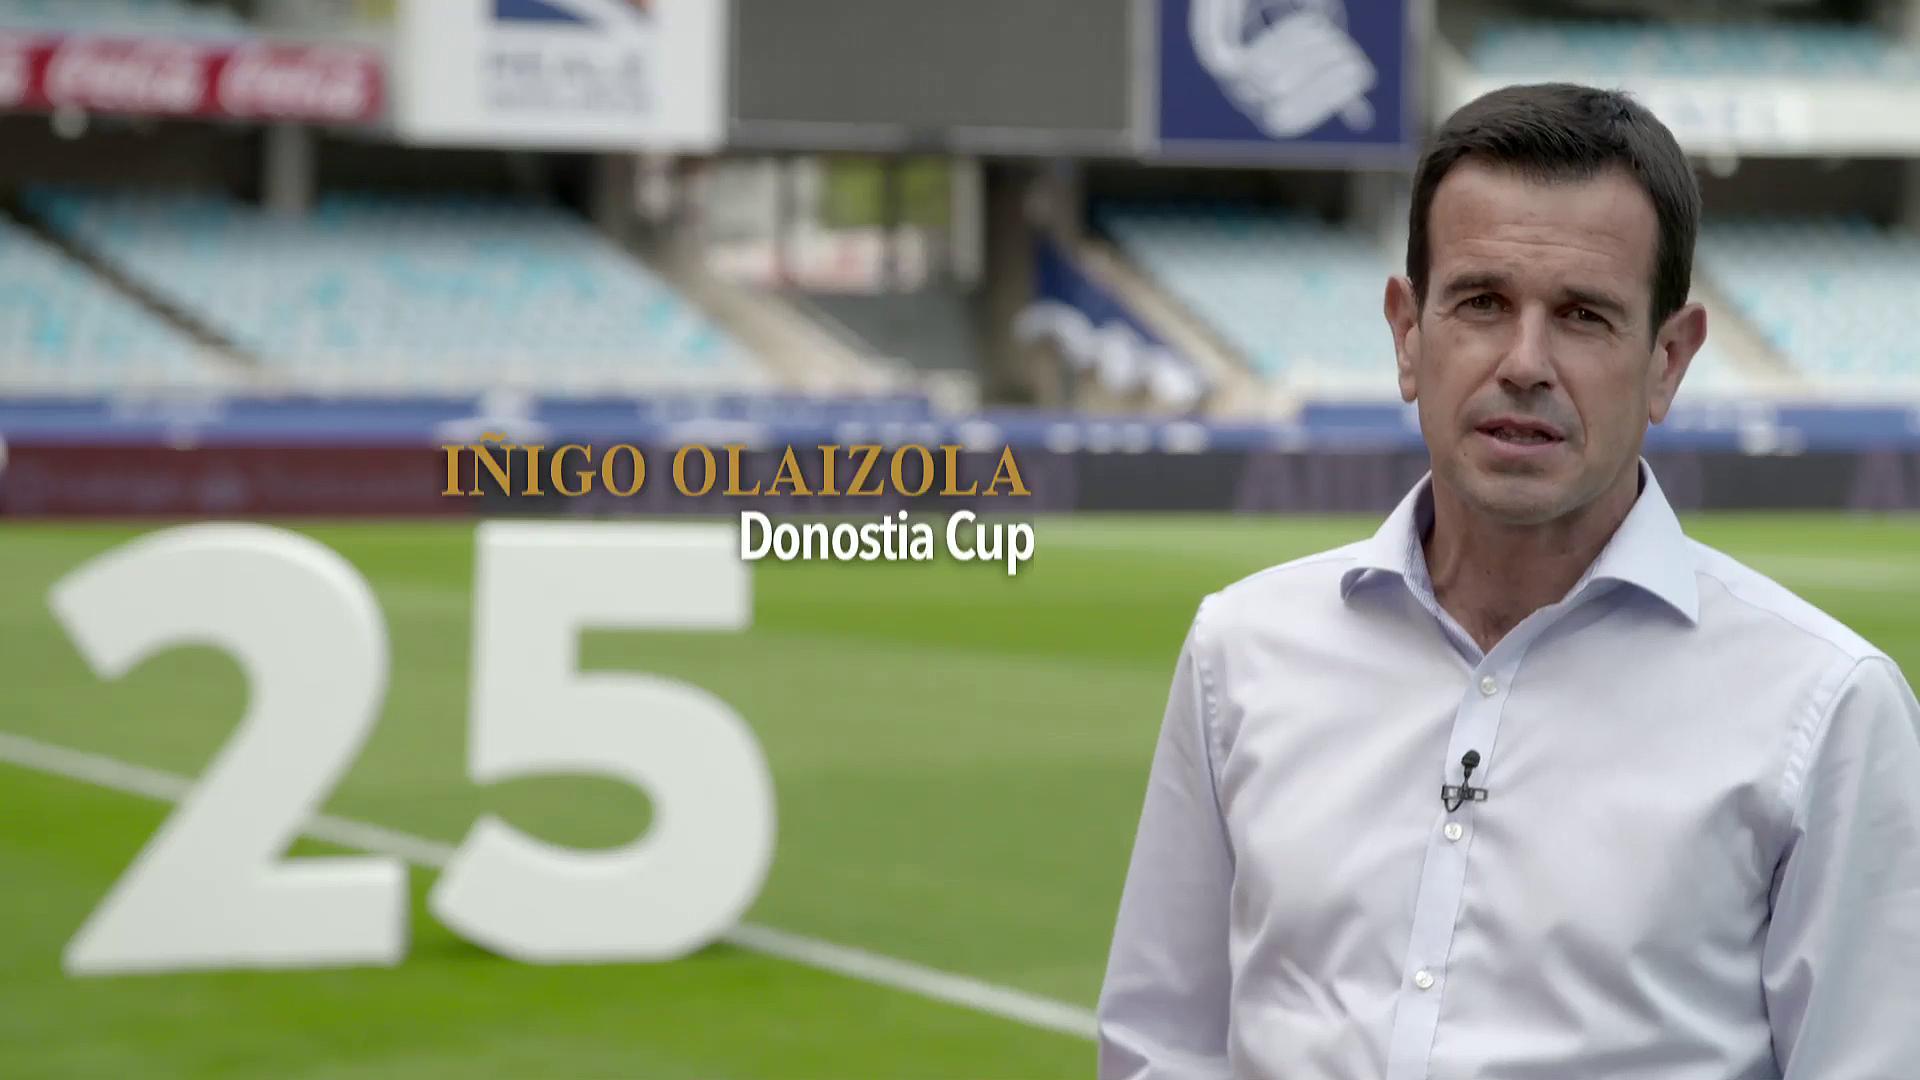 Premios Comercio y Turismo 2016. Donostia Cup25 - Iñigo Olaizola